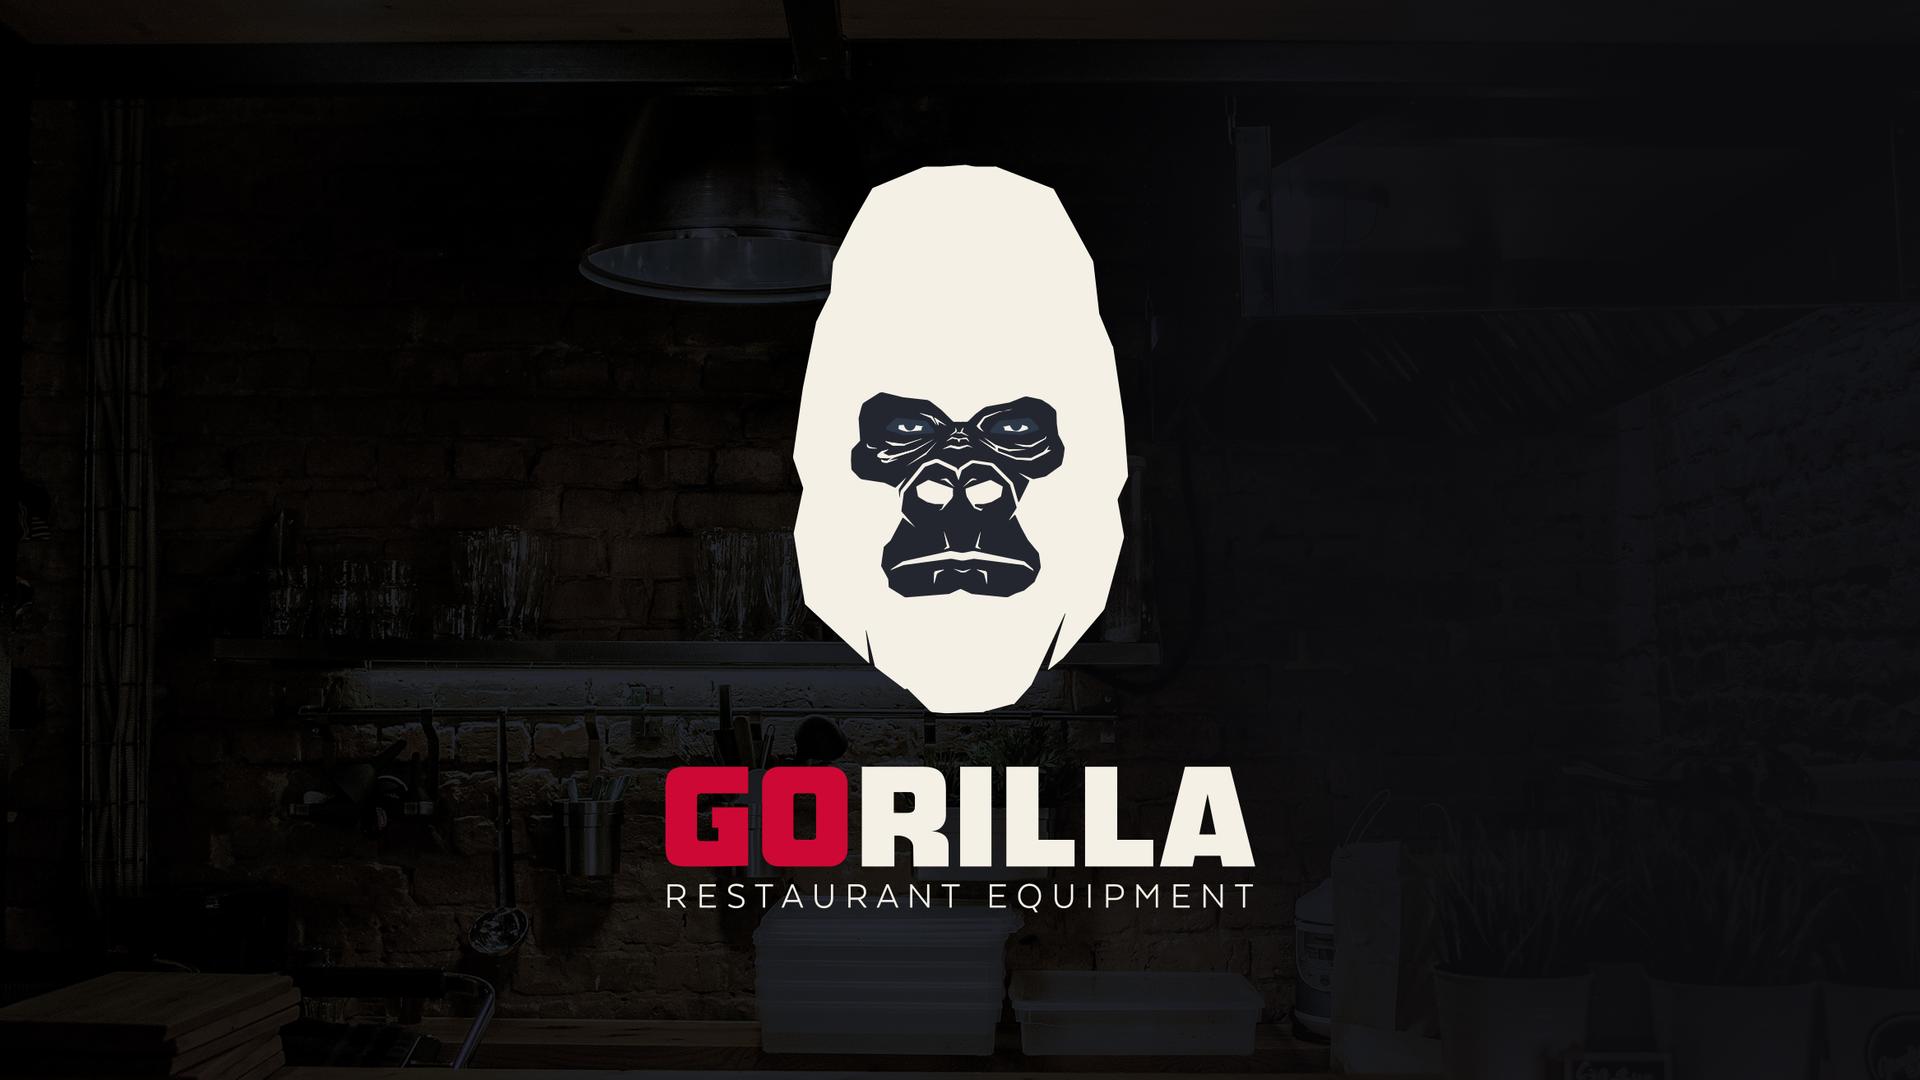 GORILLA Brand Identity Design